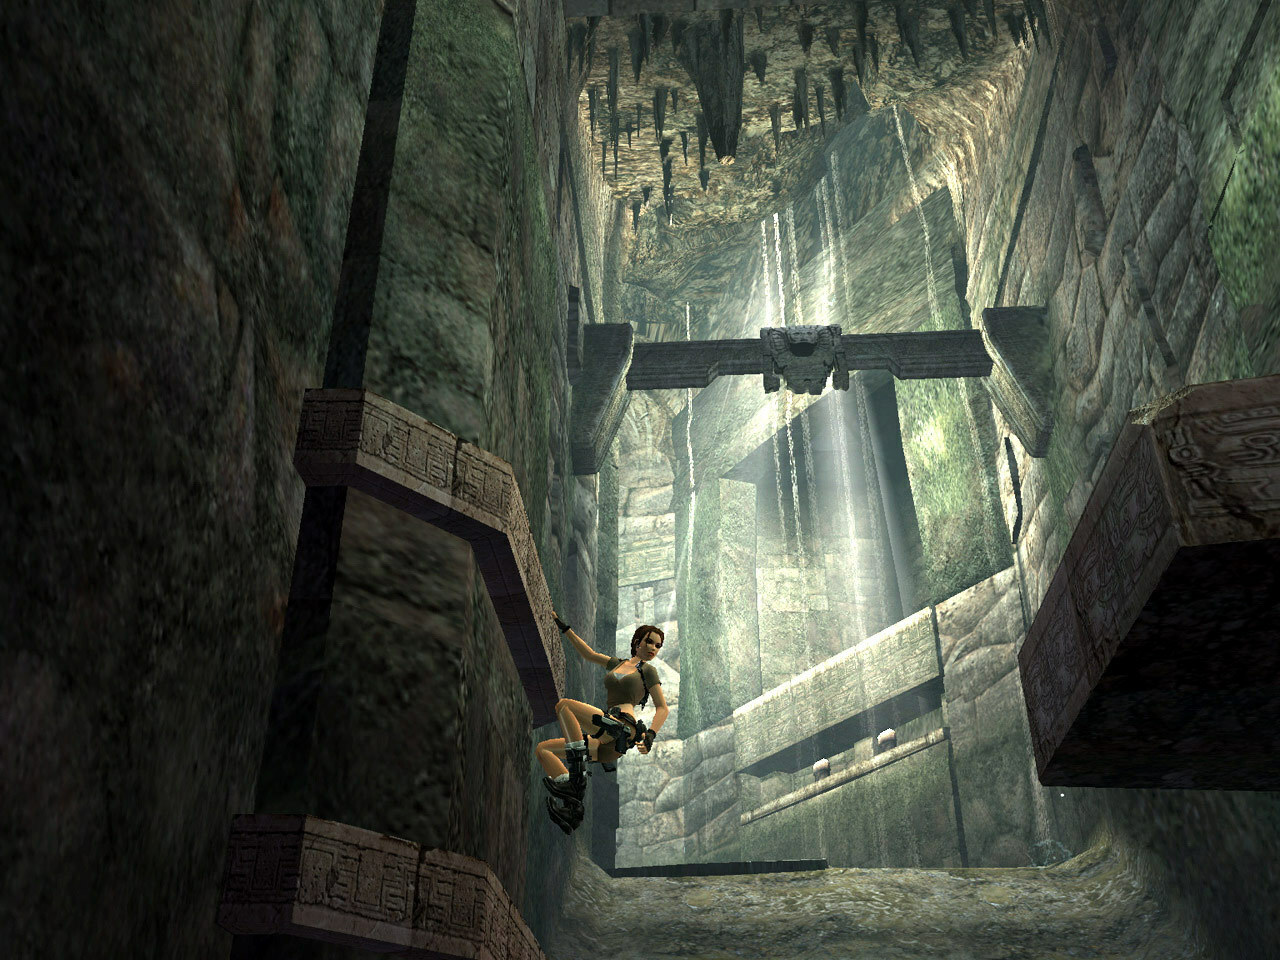 tomb-raider-legend-pc-screenshot-1